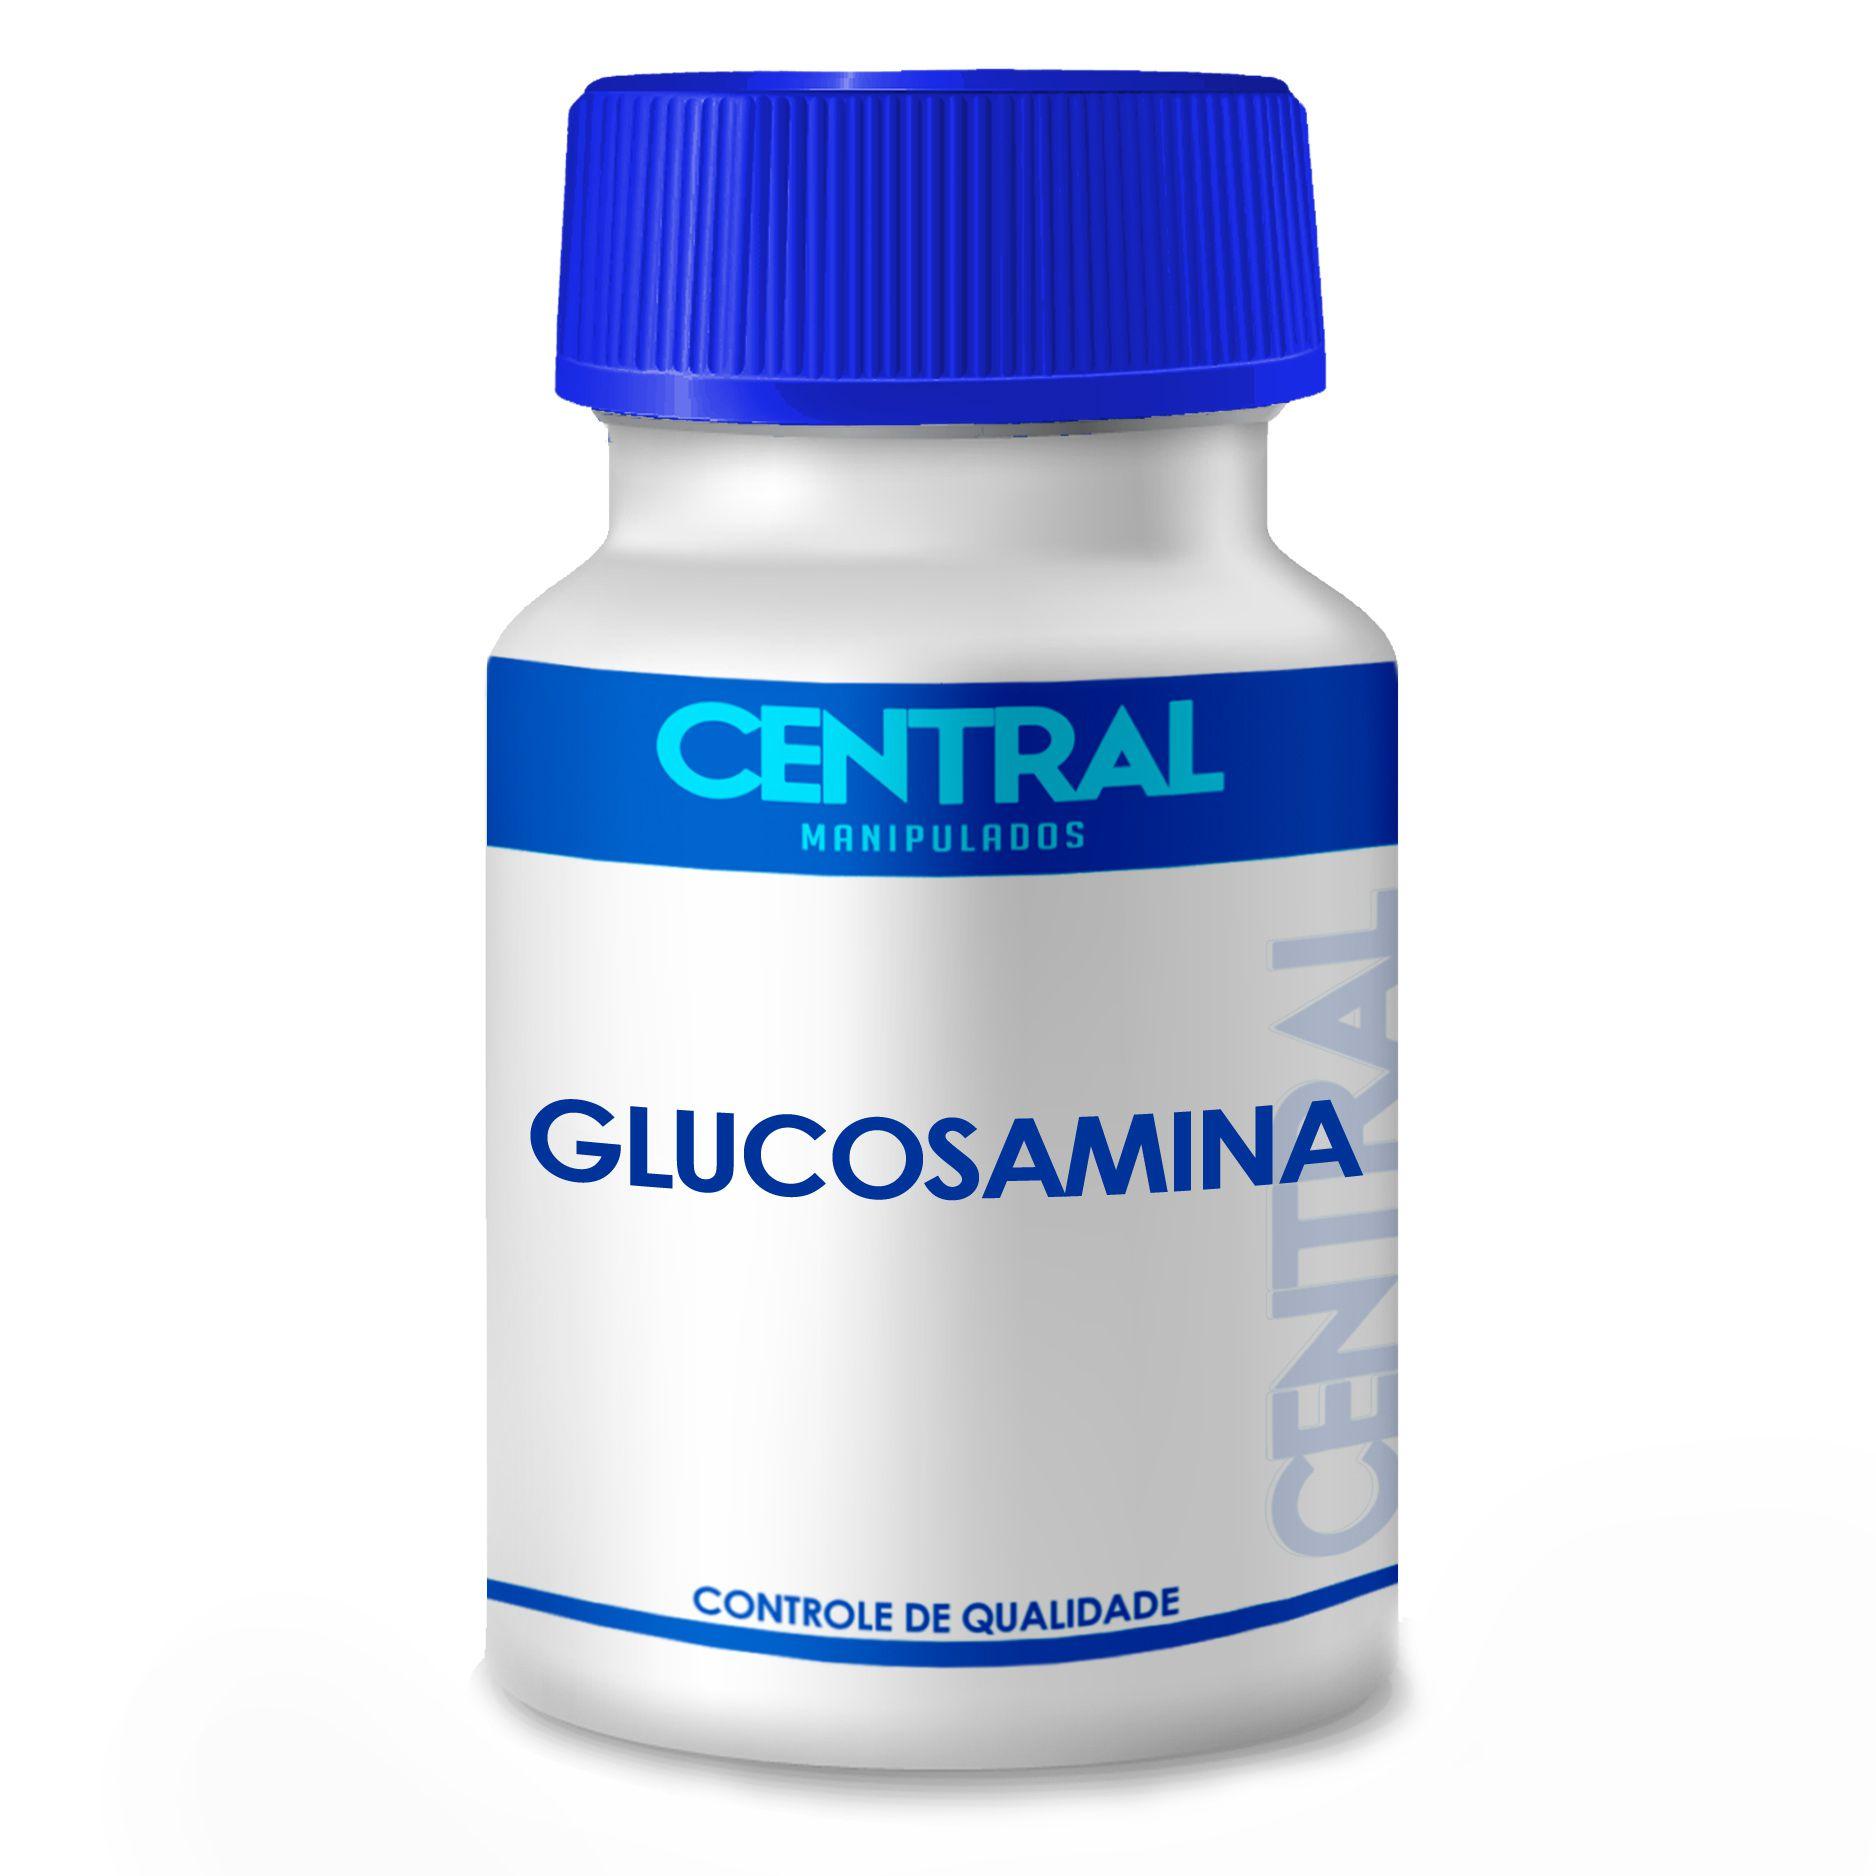 Glucosamina 500mg 60 cápsulas - tratamento de artrose ou osteoartrite